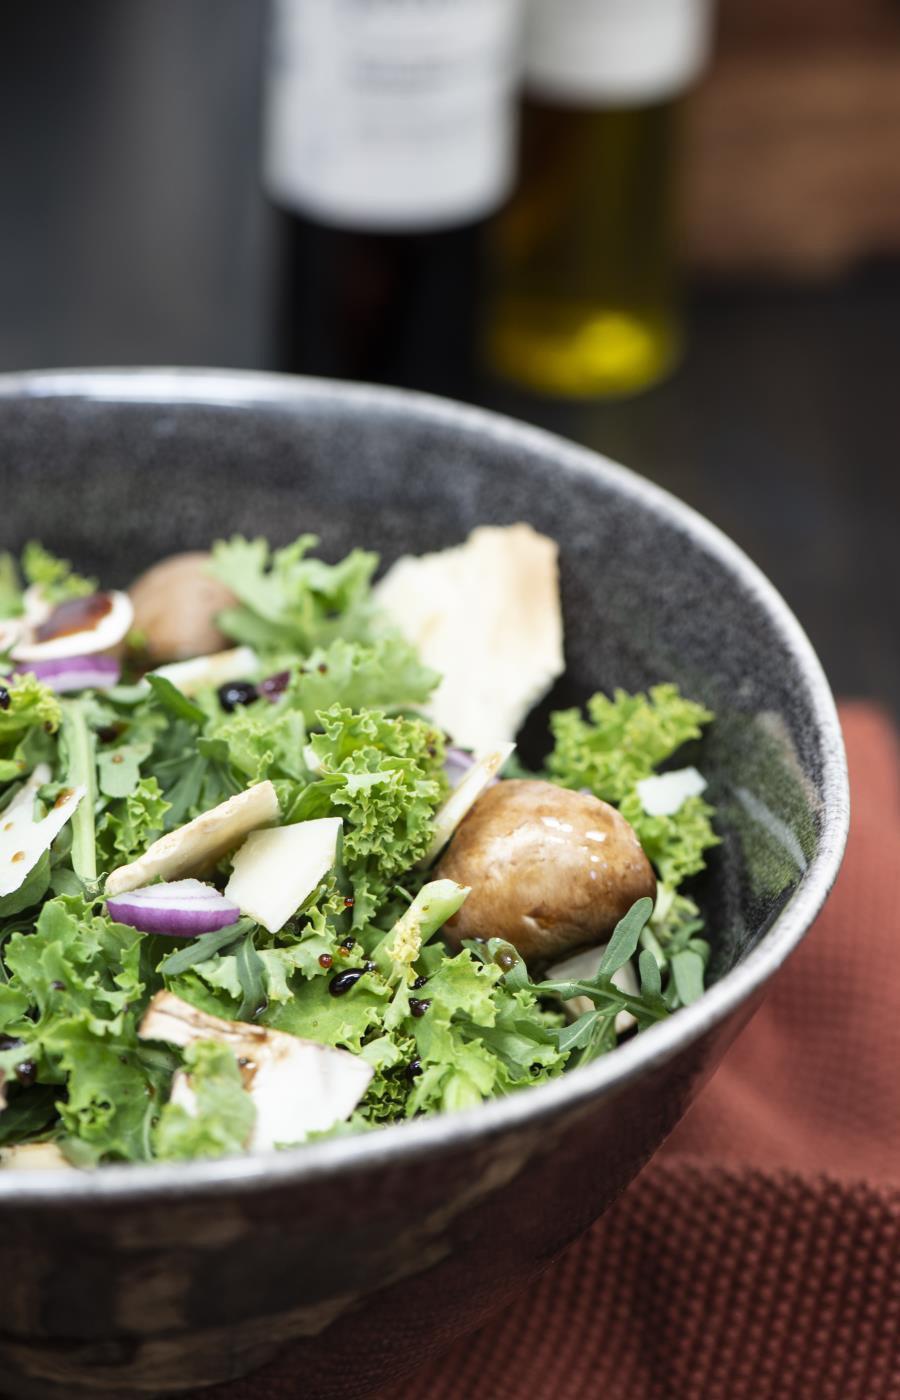 Salatschüsseln & Salatbesteck, Bild 1